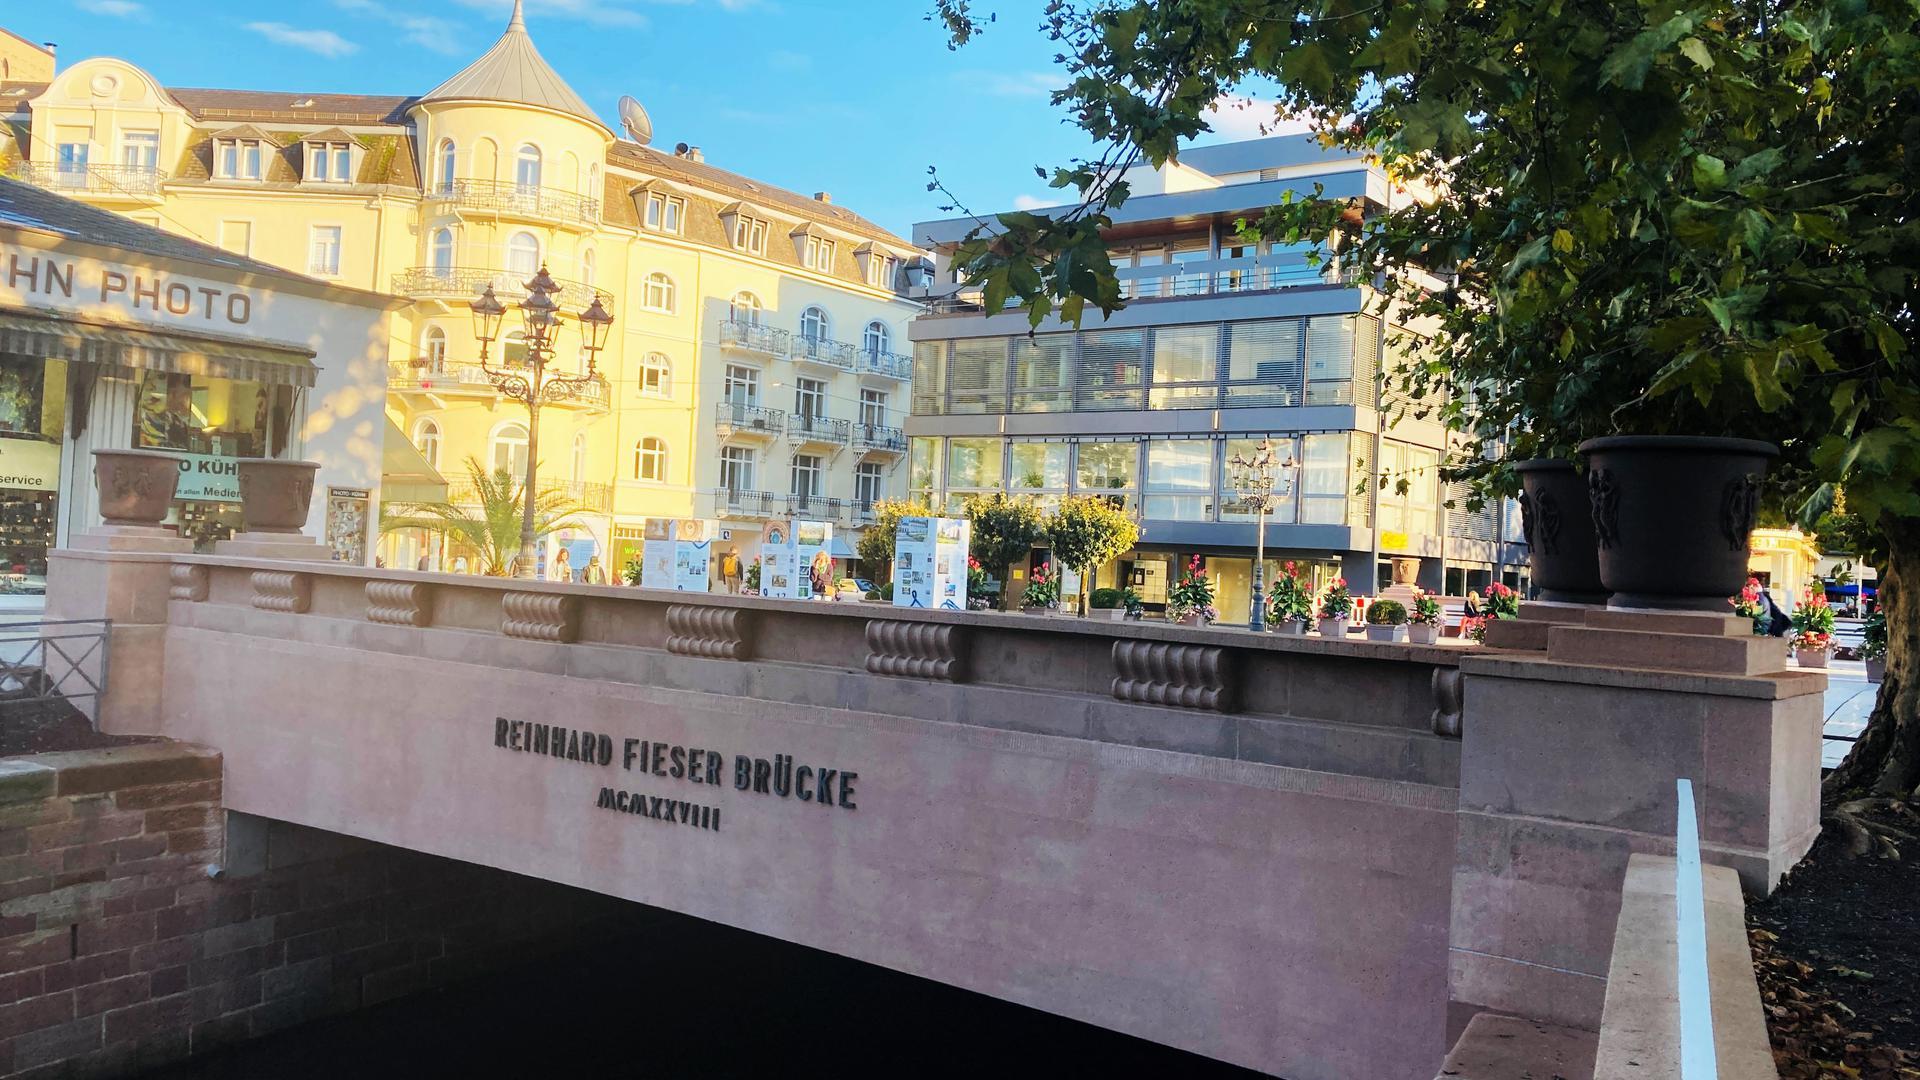 Die Fieser-Brücke in Baden-Baden